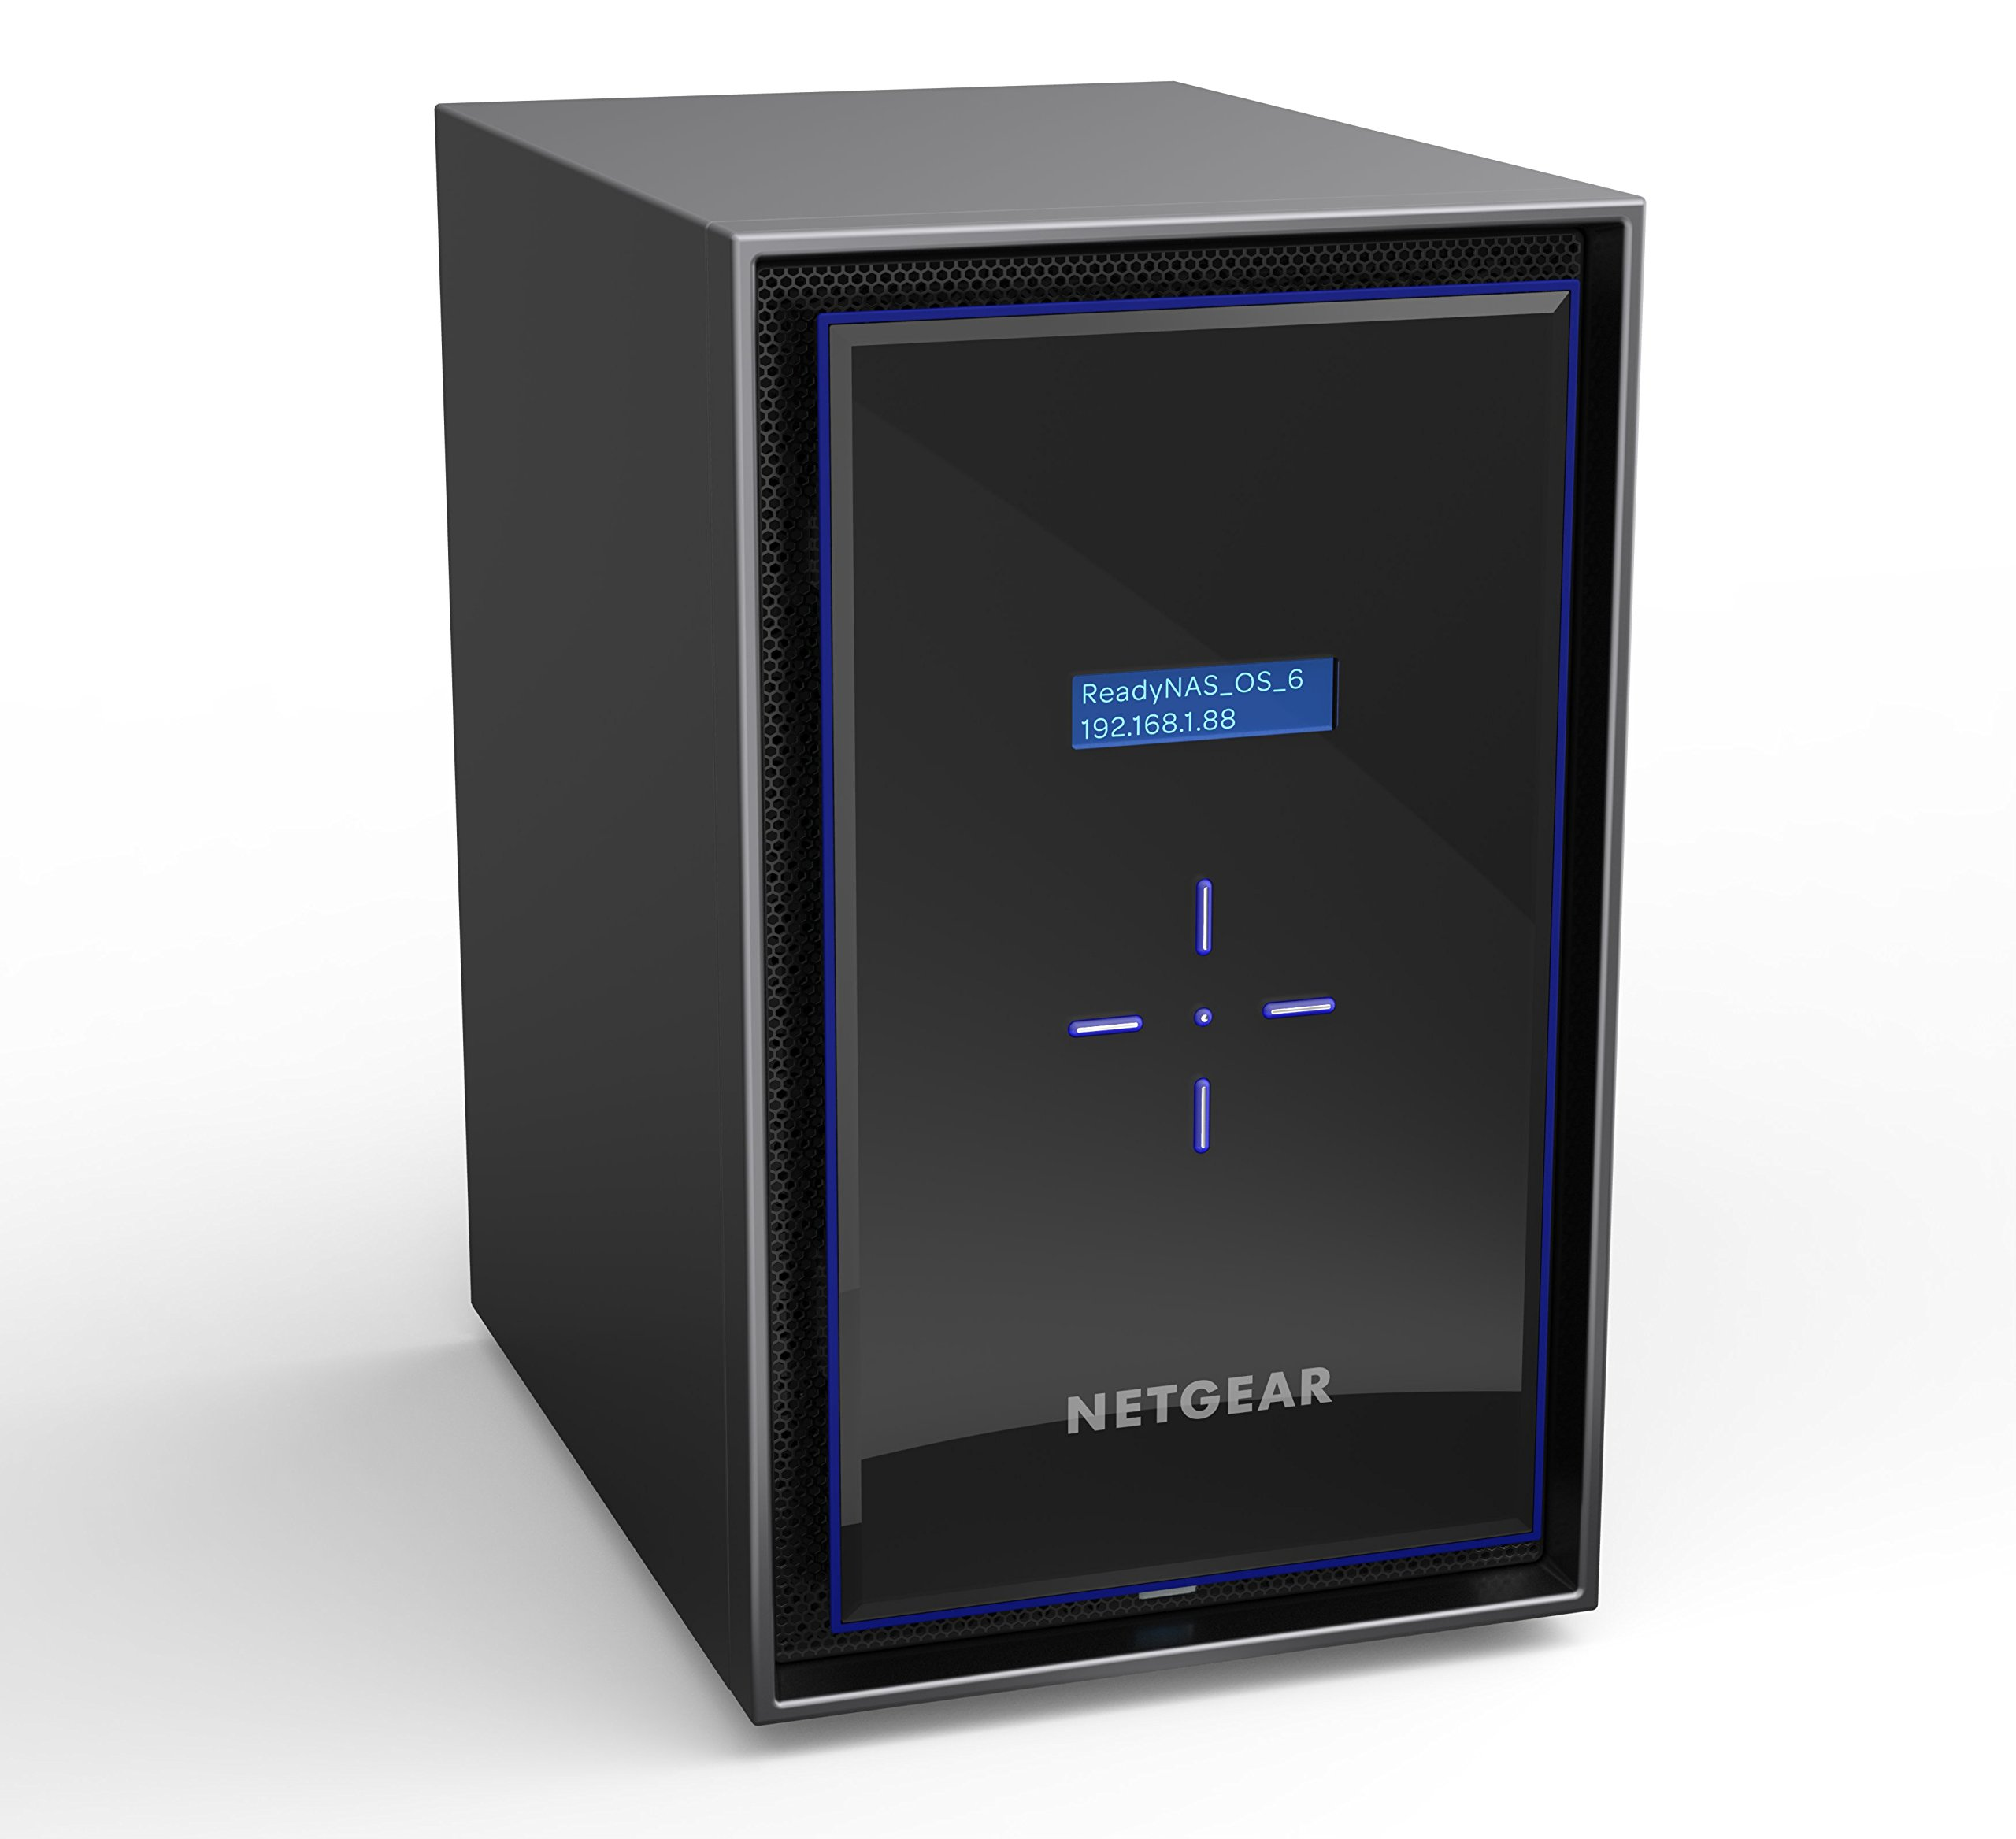 NETGEAR ReadyNAS RN428 8 Bay Diskless High Performance NAS, 80TB Capacity Network Attached Storage, Intel 2.1GHz Quad Core Processor, 4GB RAM, (RN42800)